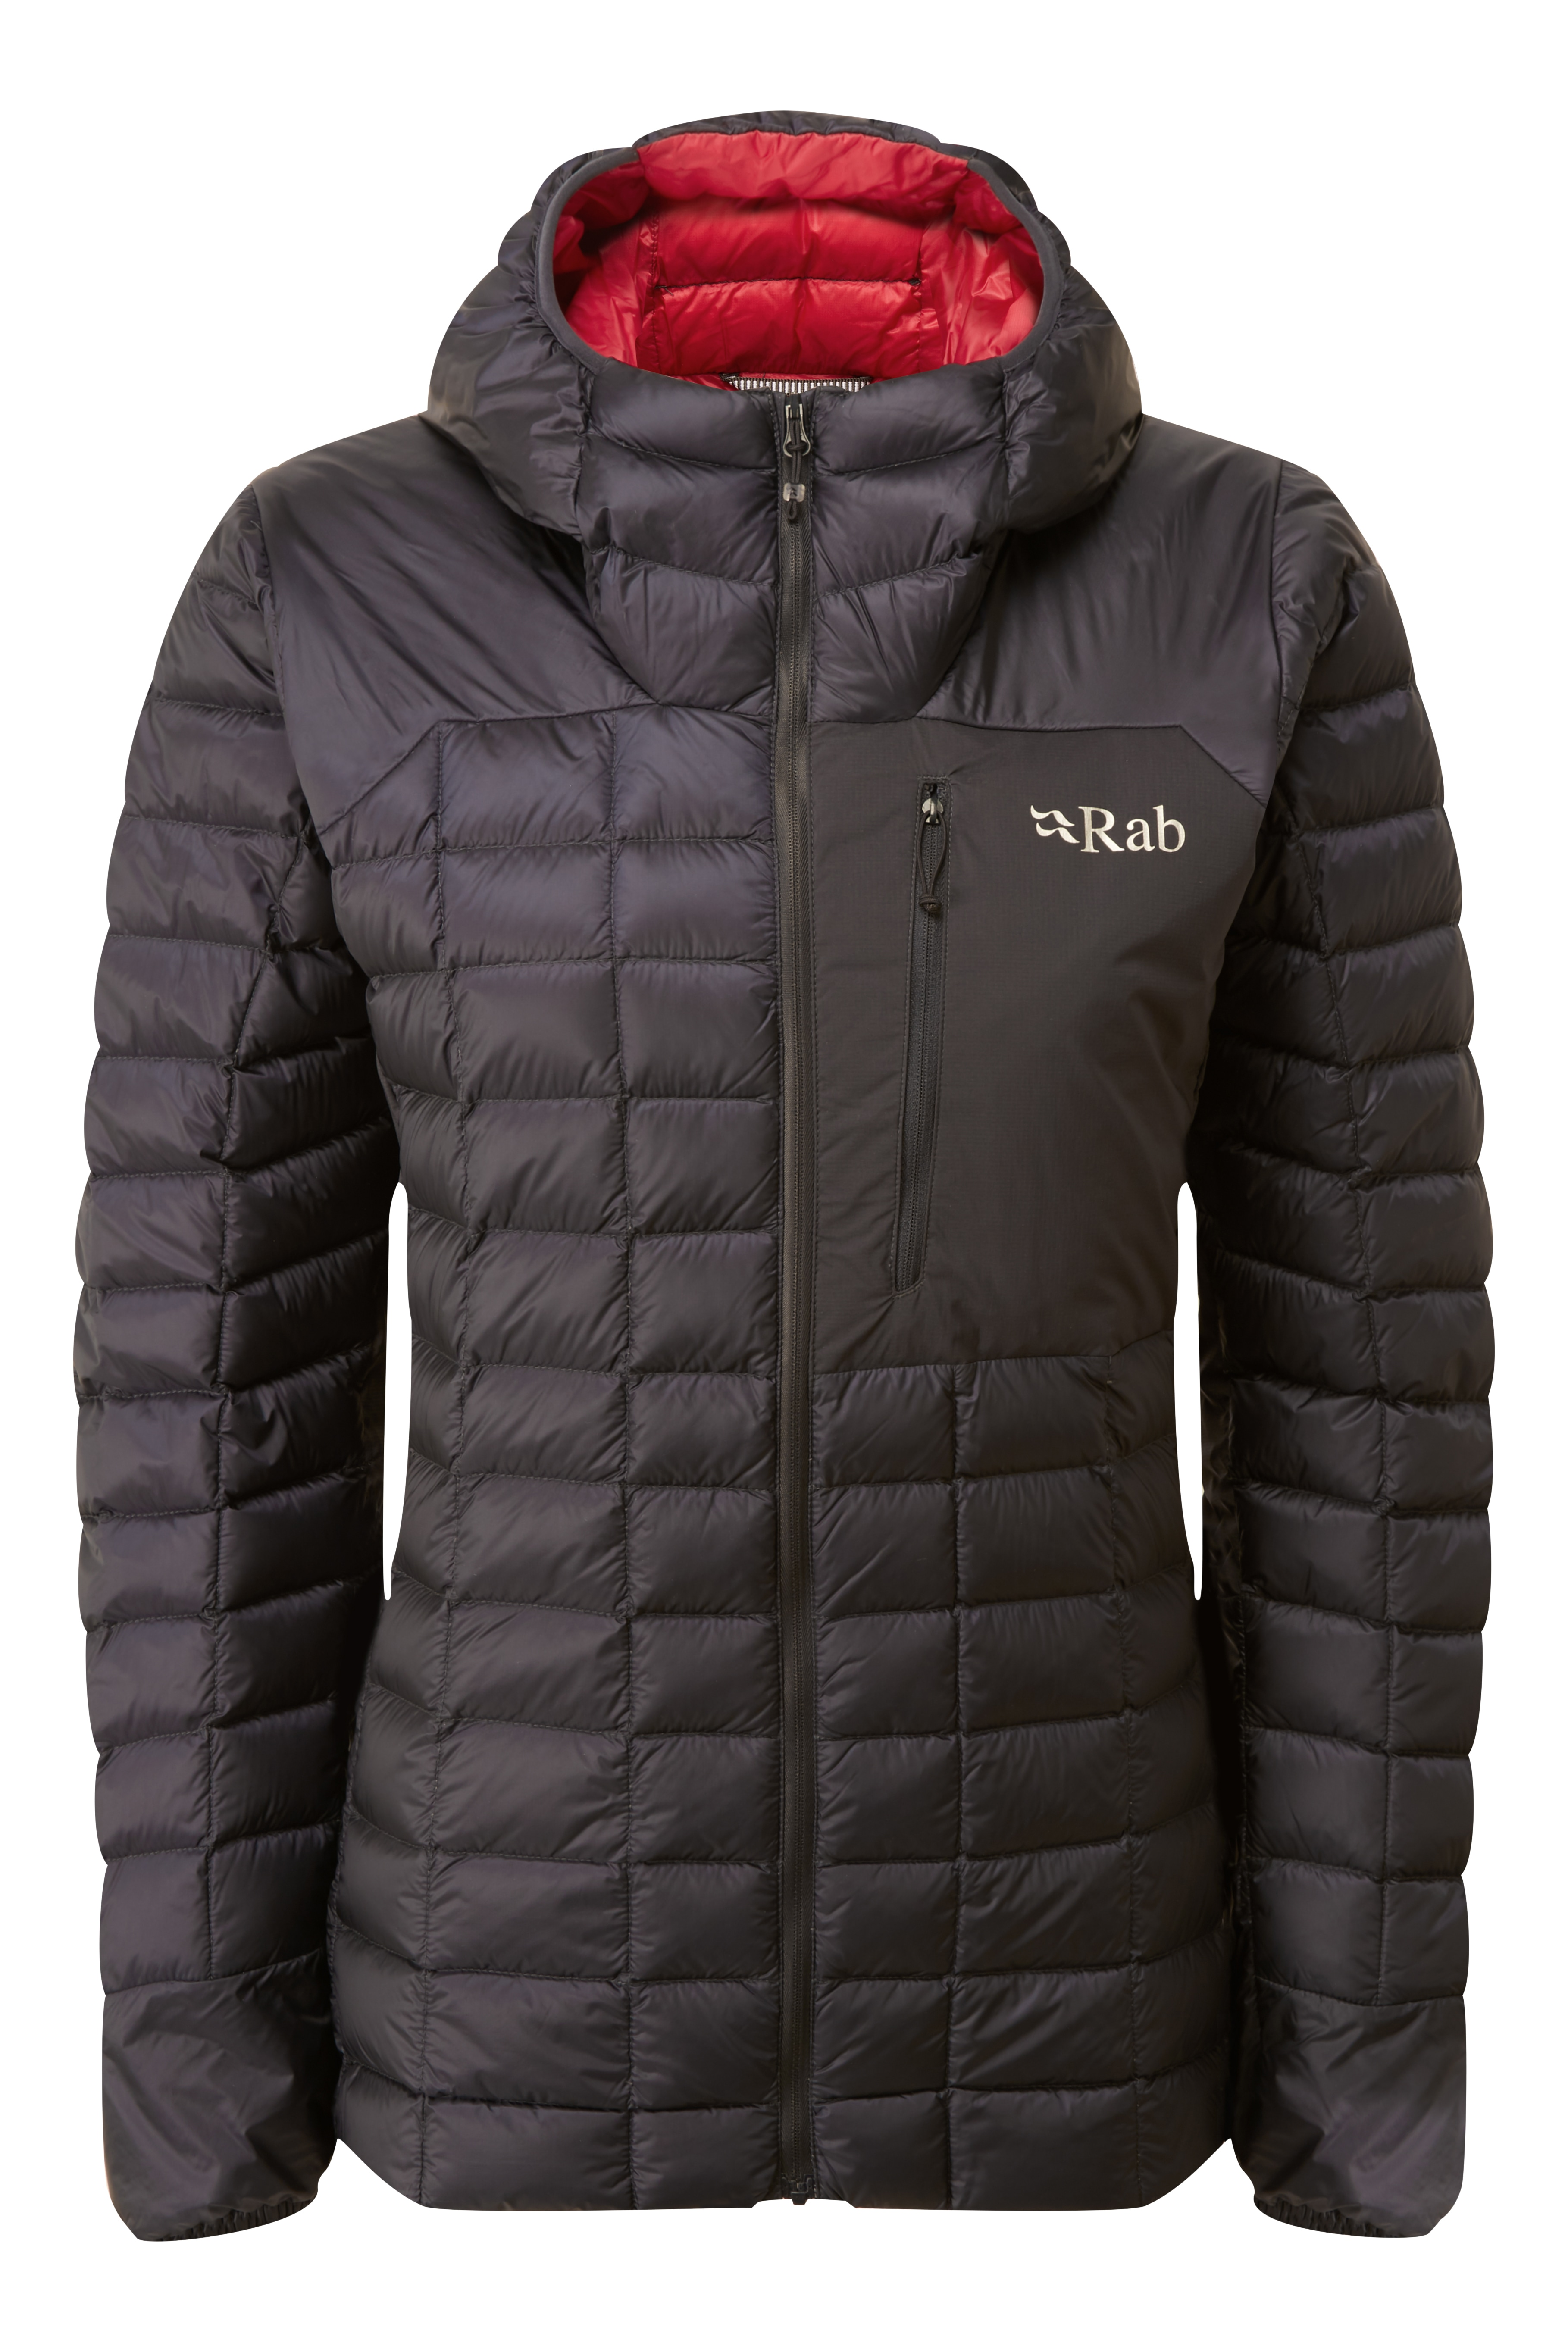 RAB Kaon Jacket W's